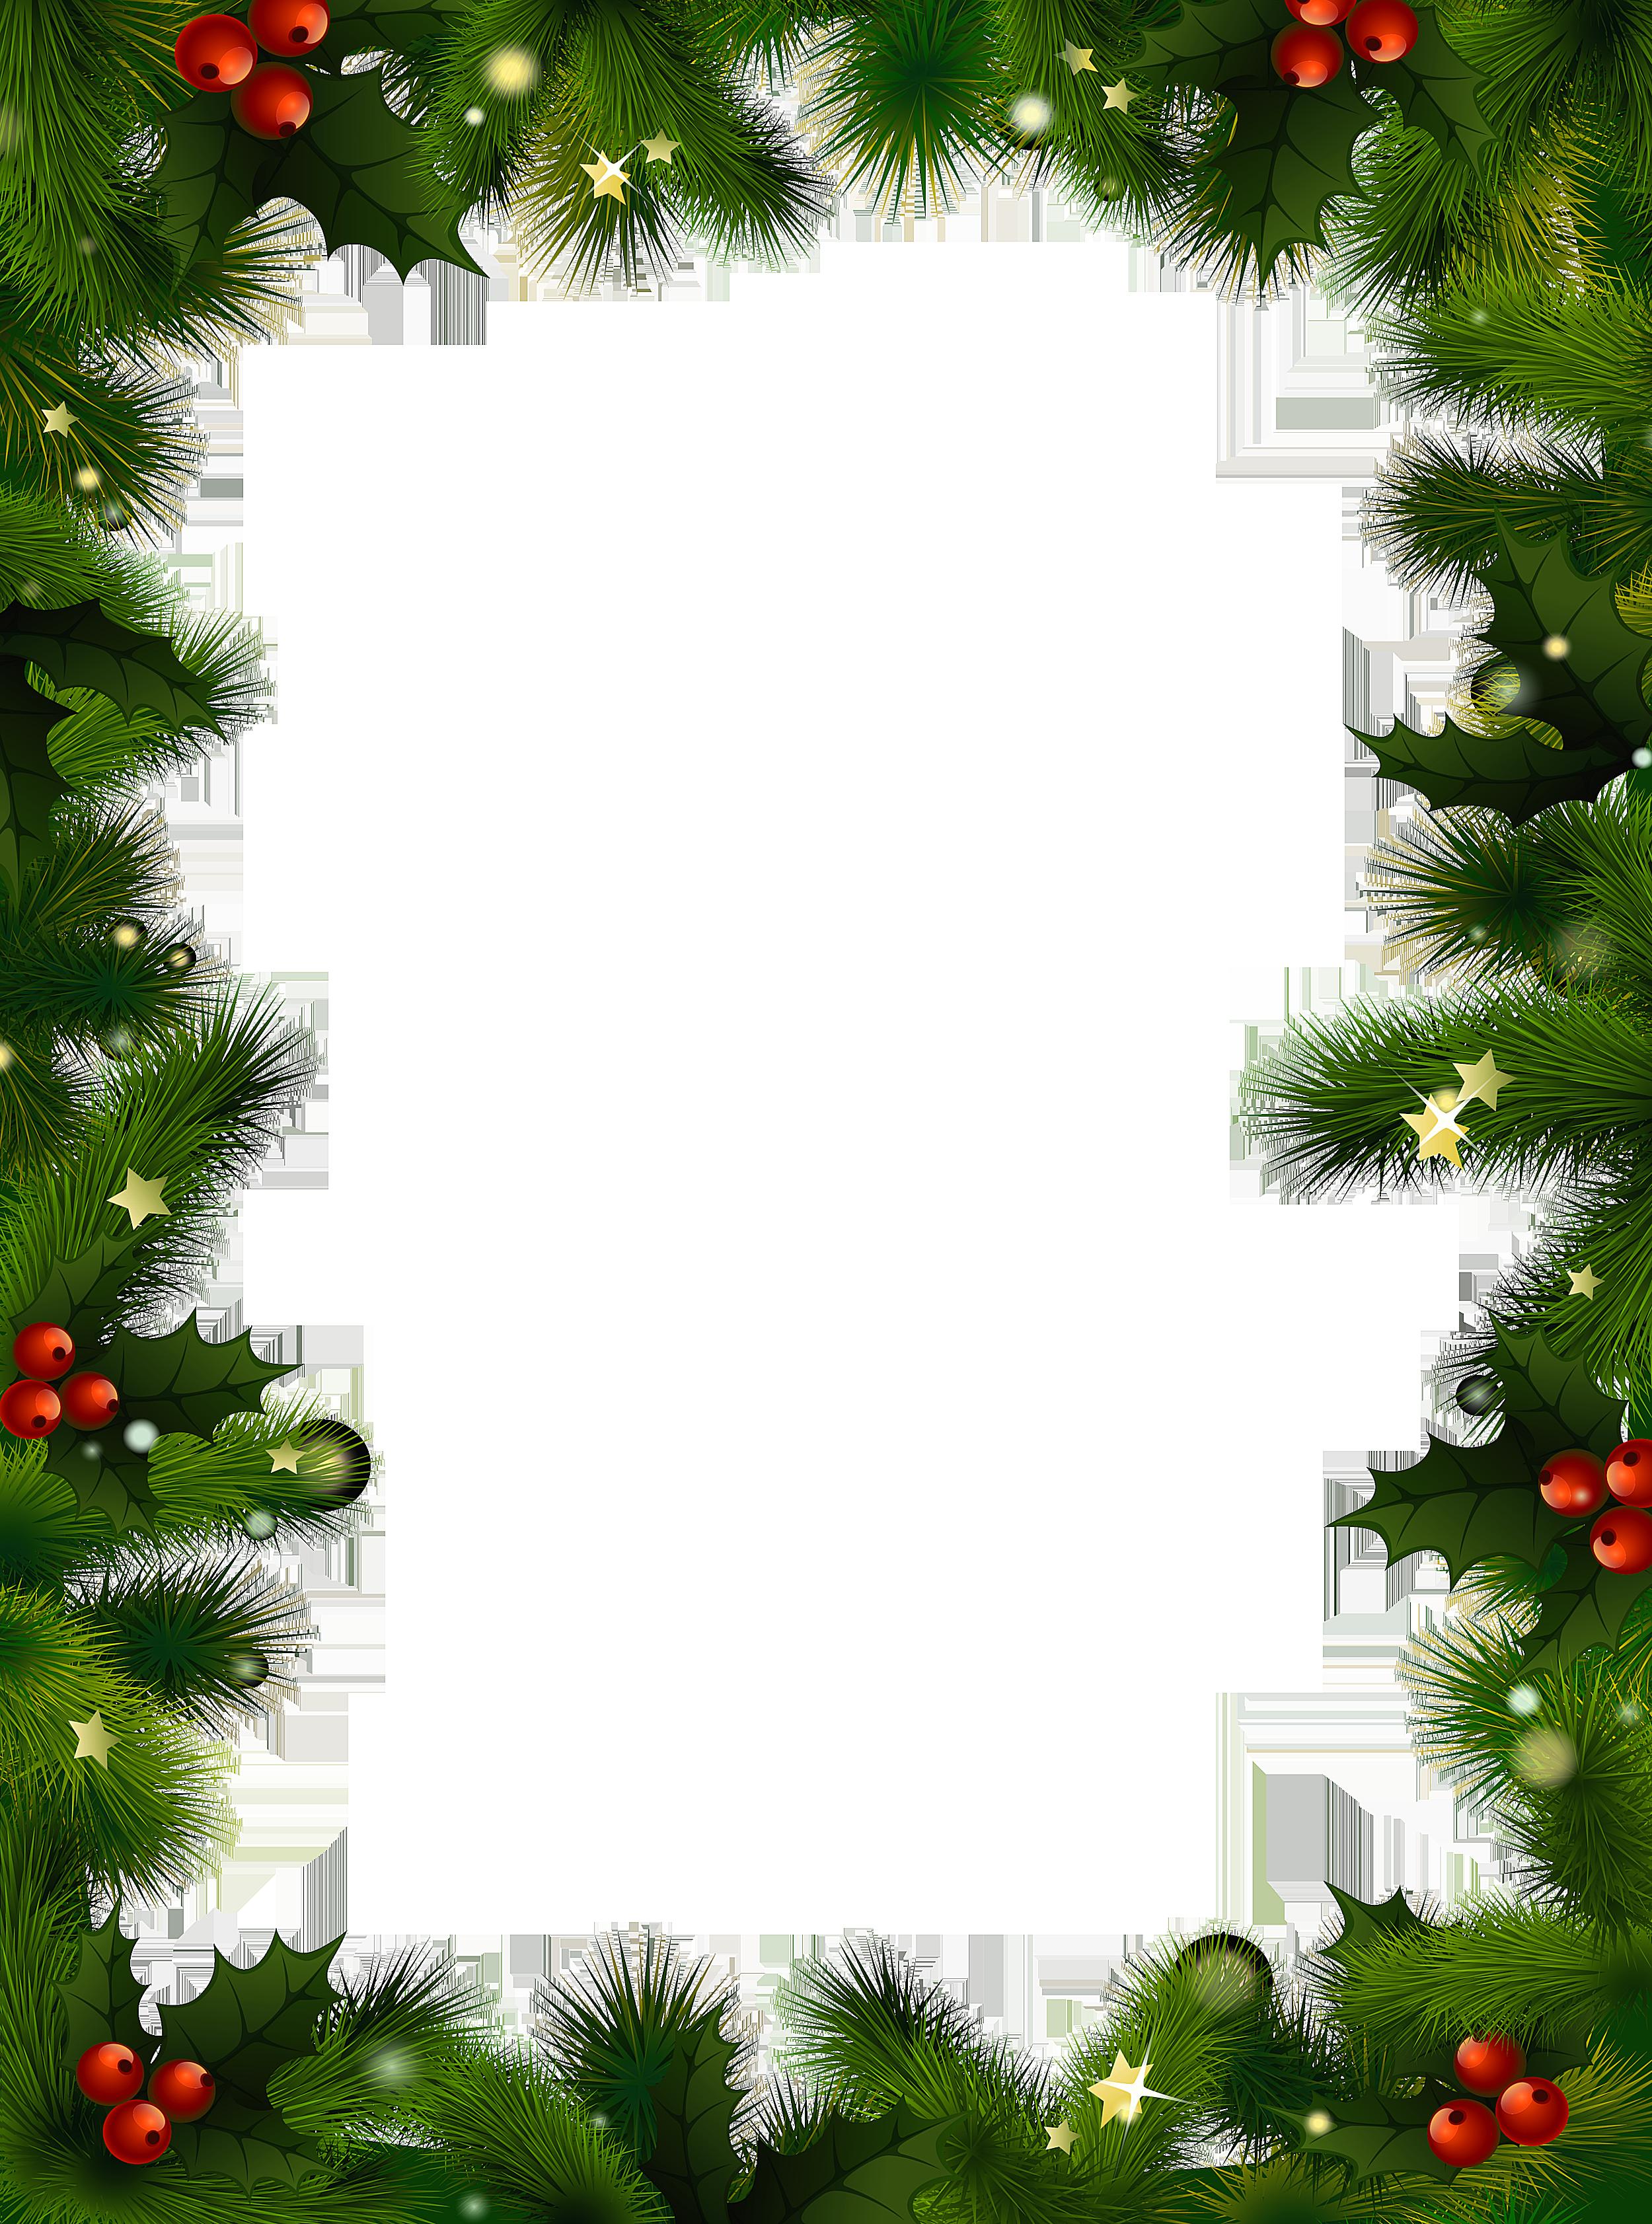 Free Christmas Borders You Ca - Christmas Border Clipart